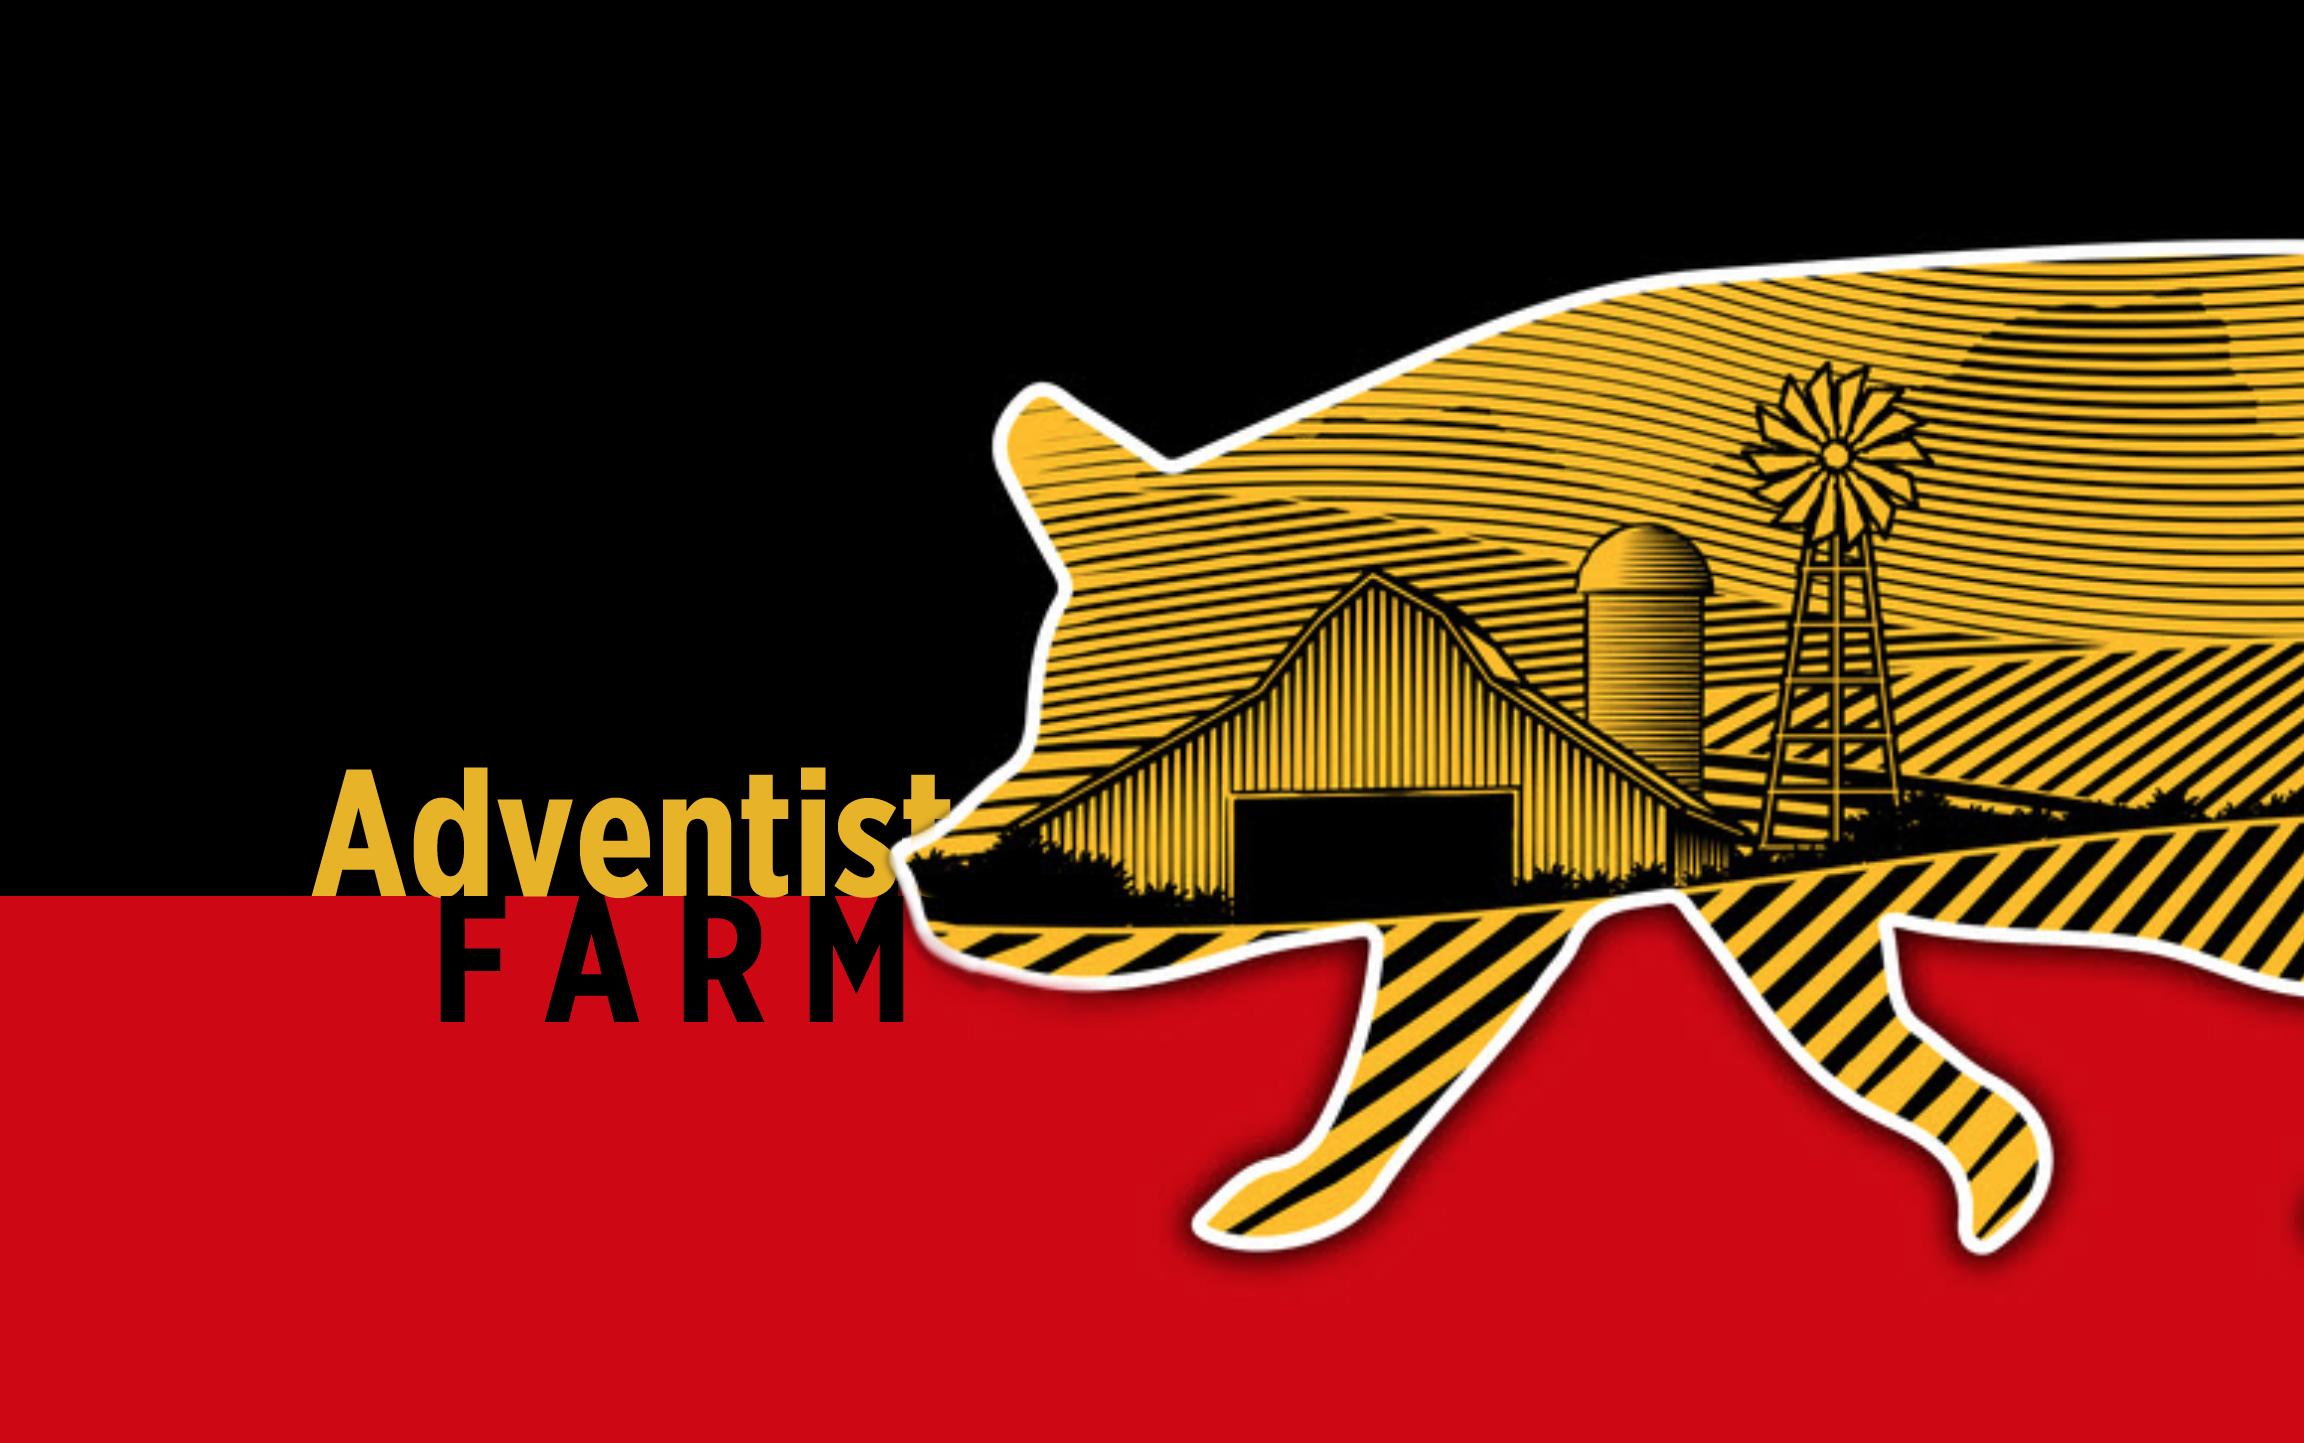 Adventist Farm